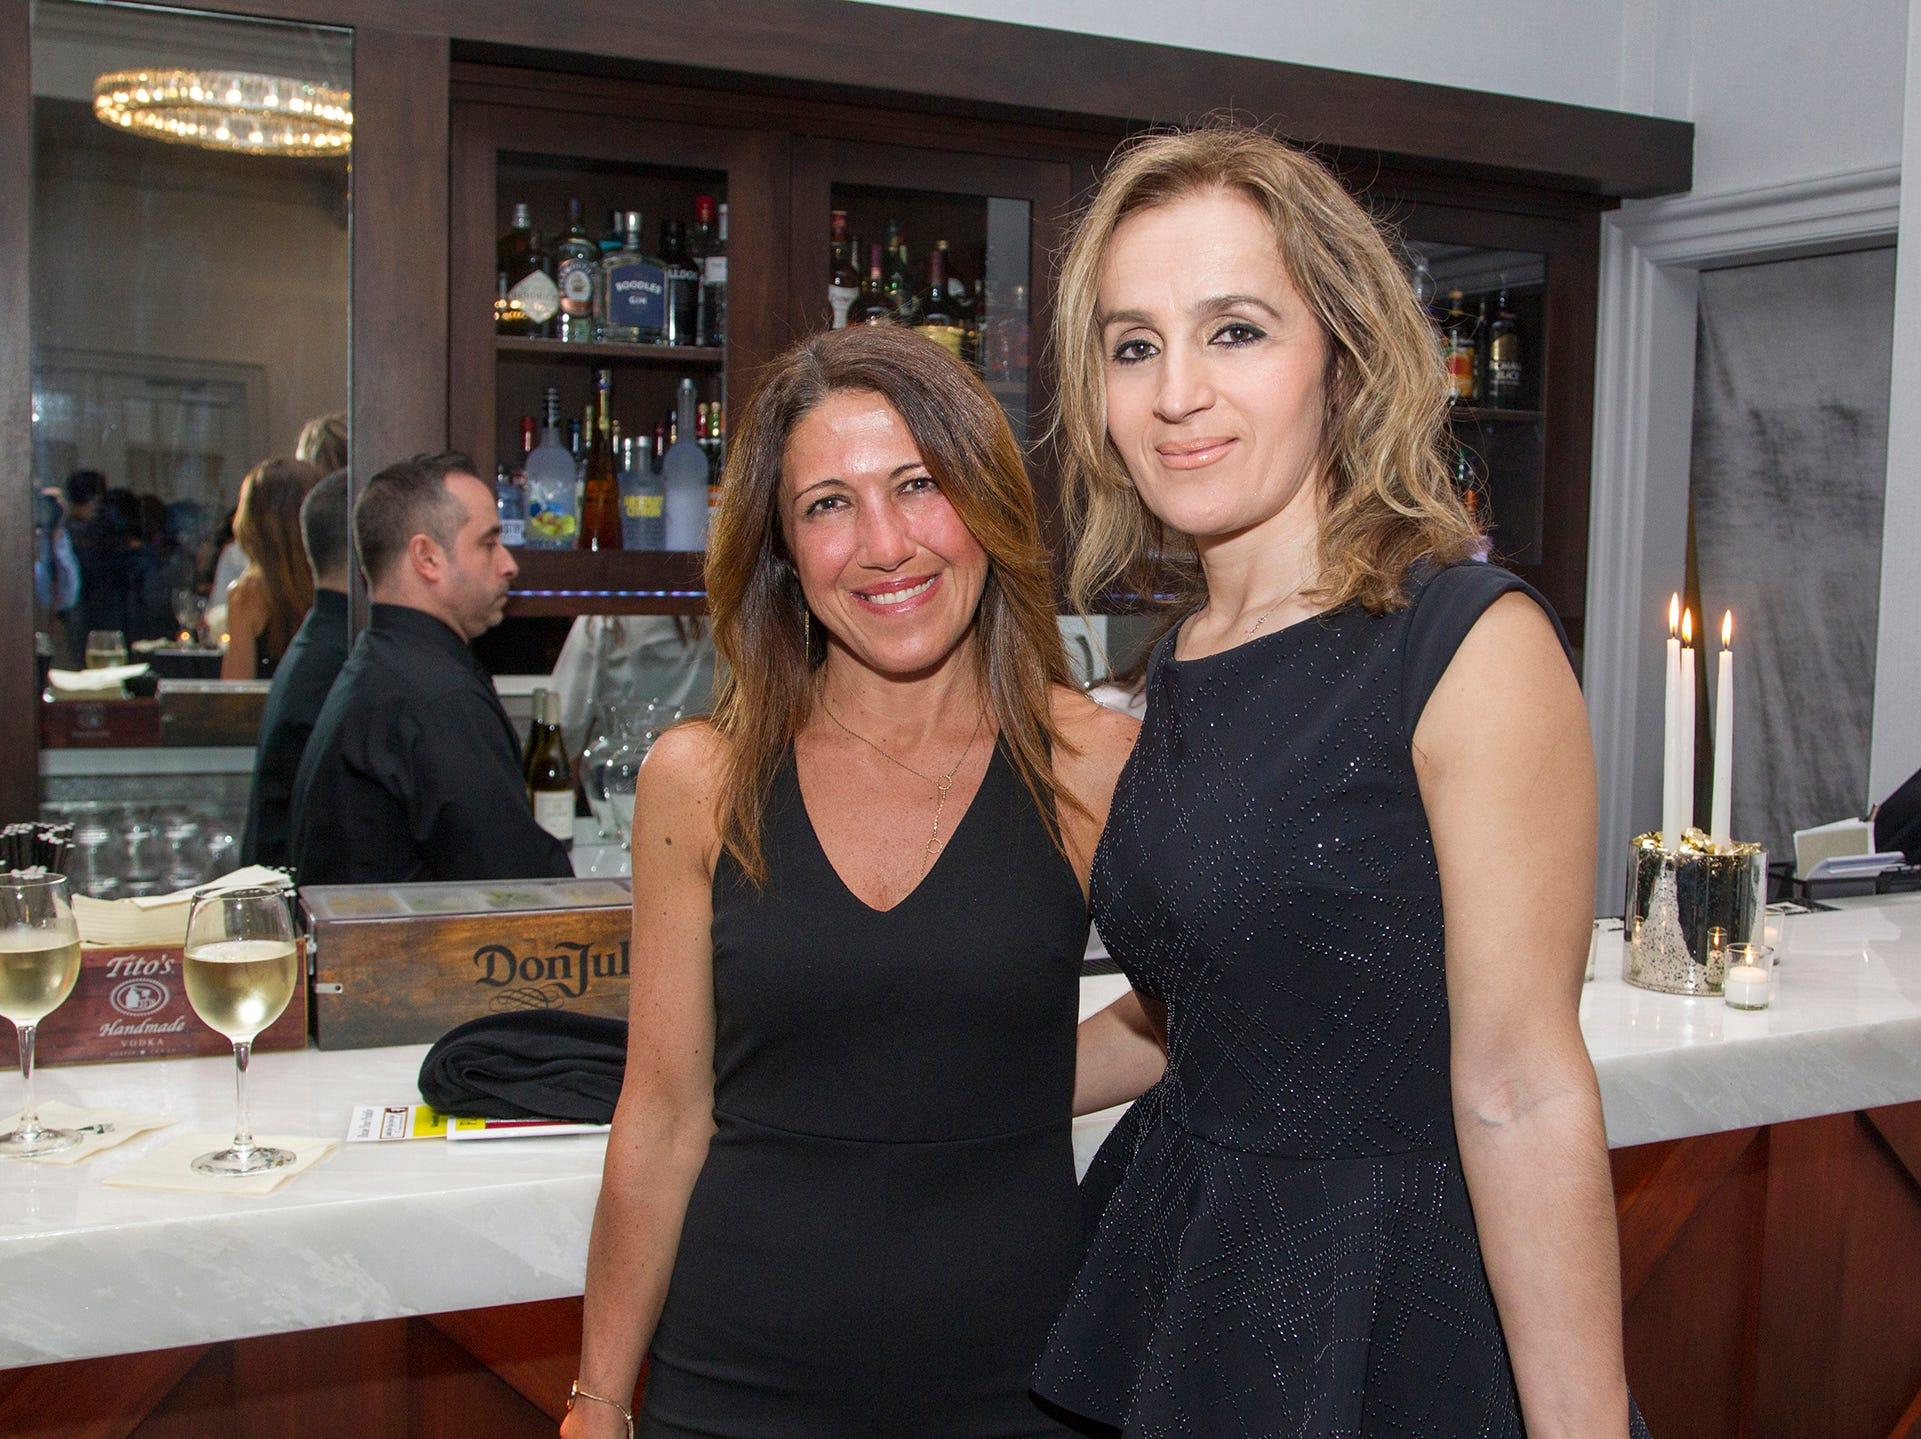 Alexandra Gannotti, Sefide Martinavilch. Saddle River Day Annual Gala at Alpine Country Club 04/13/2019